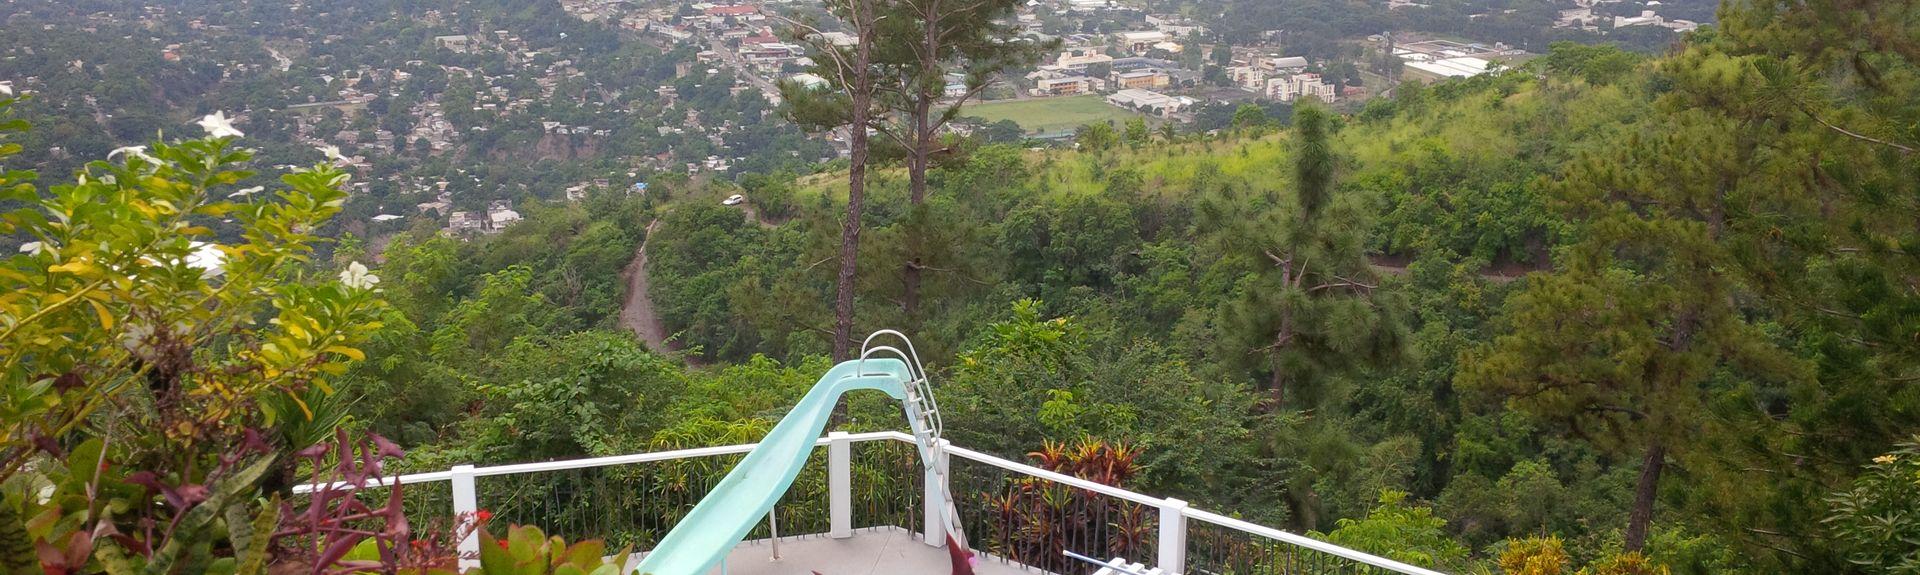 Jack's Hill, Kingston, Surrey County, Jamaica